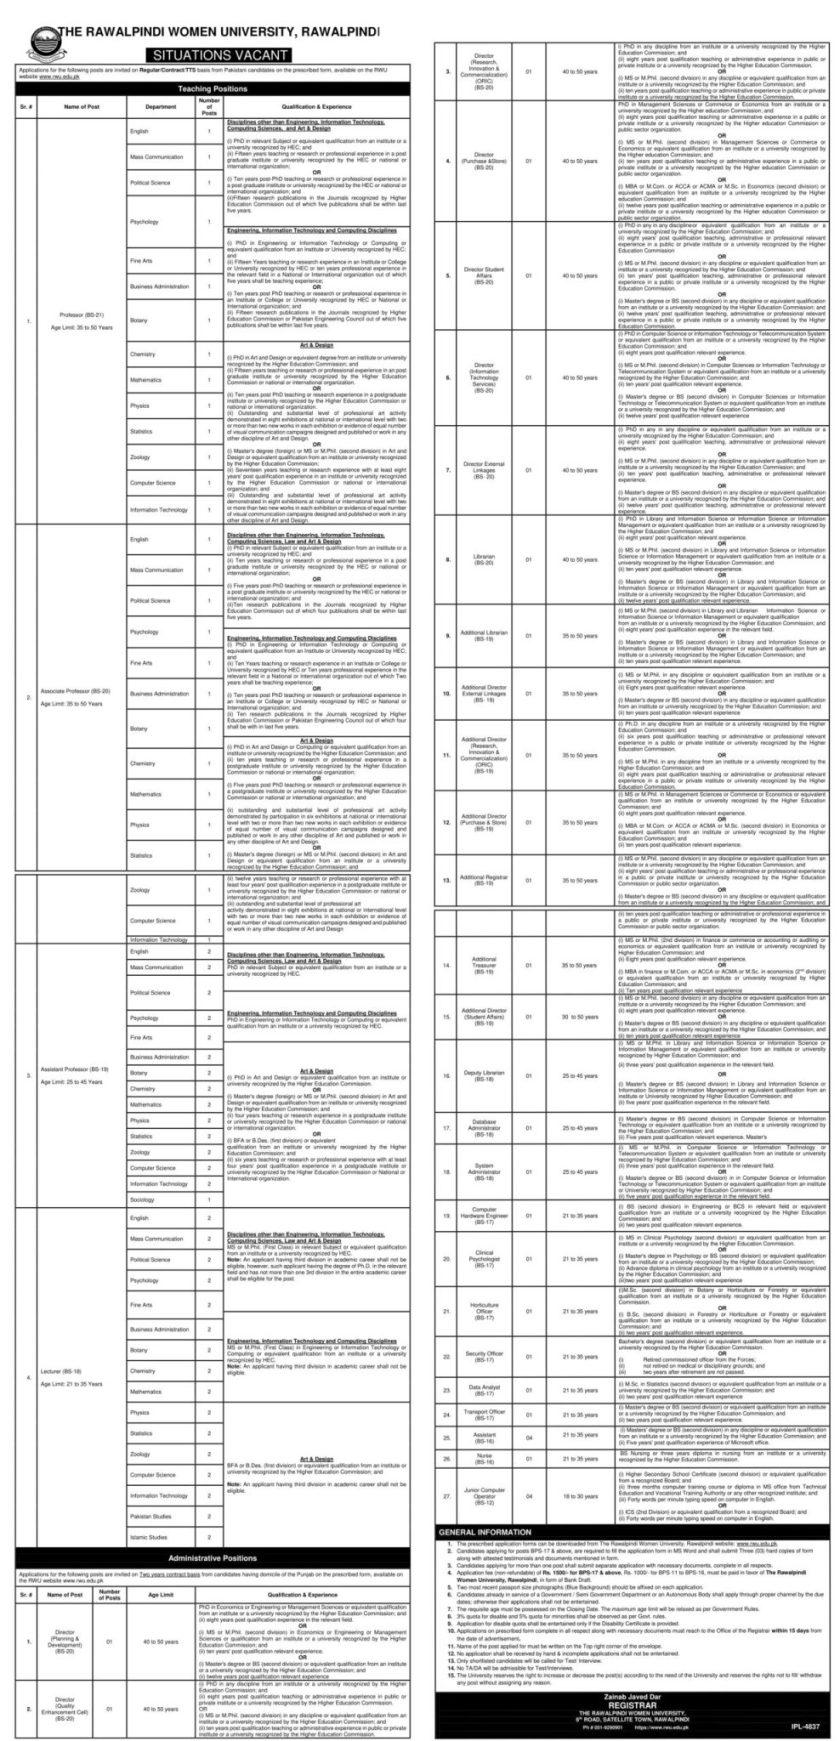 Rawalpindi Women University RWU Jobs 2021